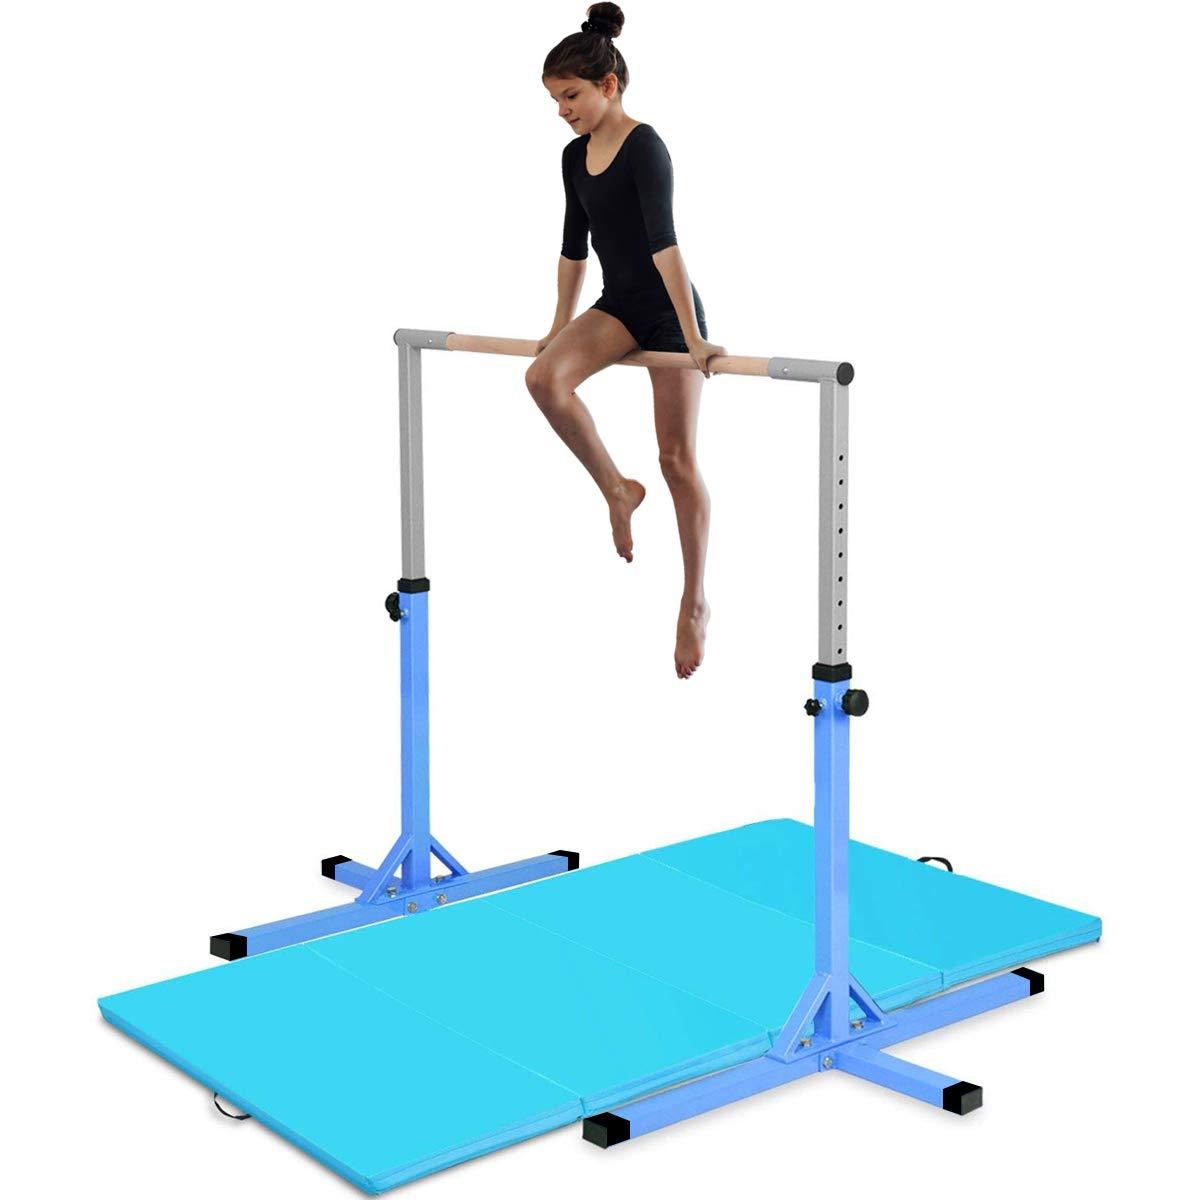 Amazon.com : Costzon Junior Training Bar, Gymnastics Adjustable Steel Gymnastic Horizontal Bar with 4 ft Gymnastics Mat (Blue) : Sports & Outdoors